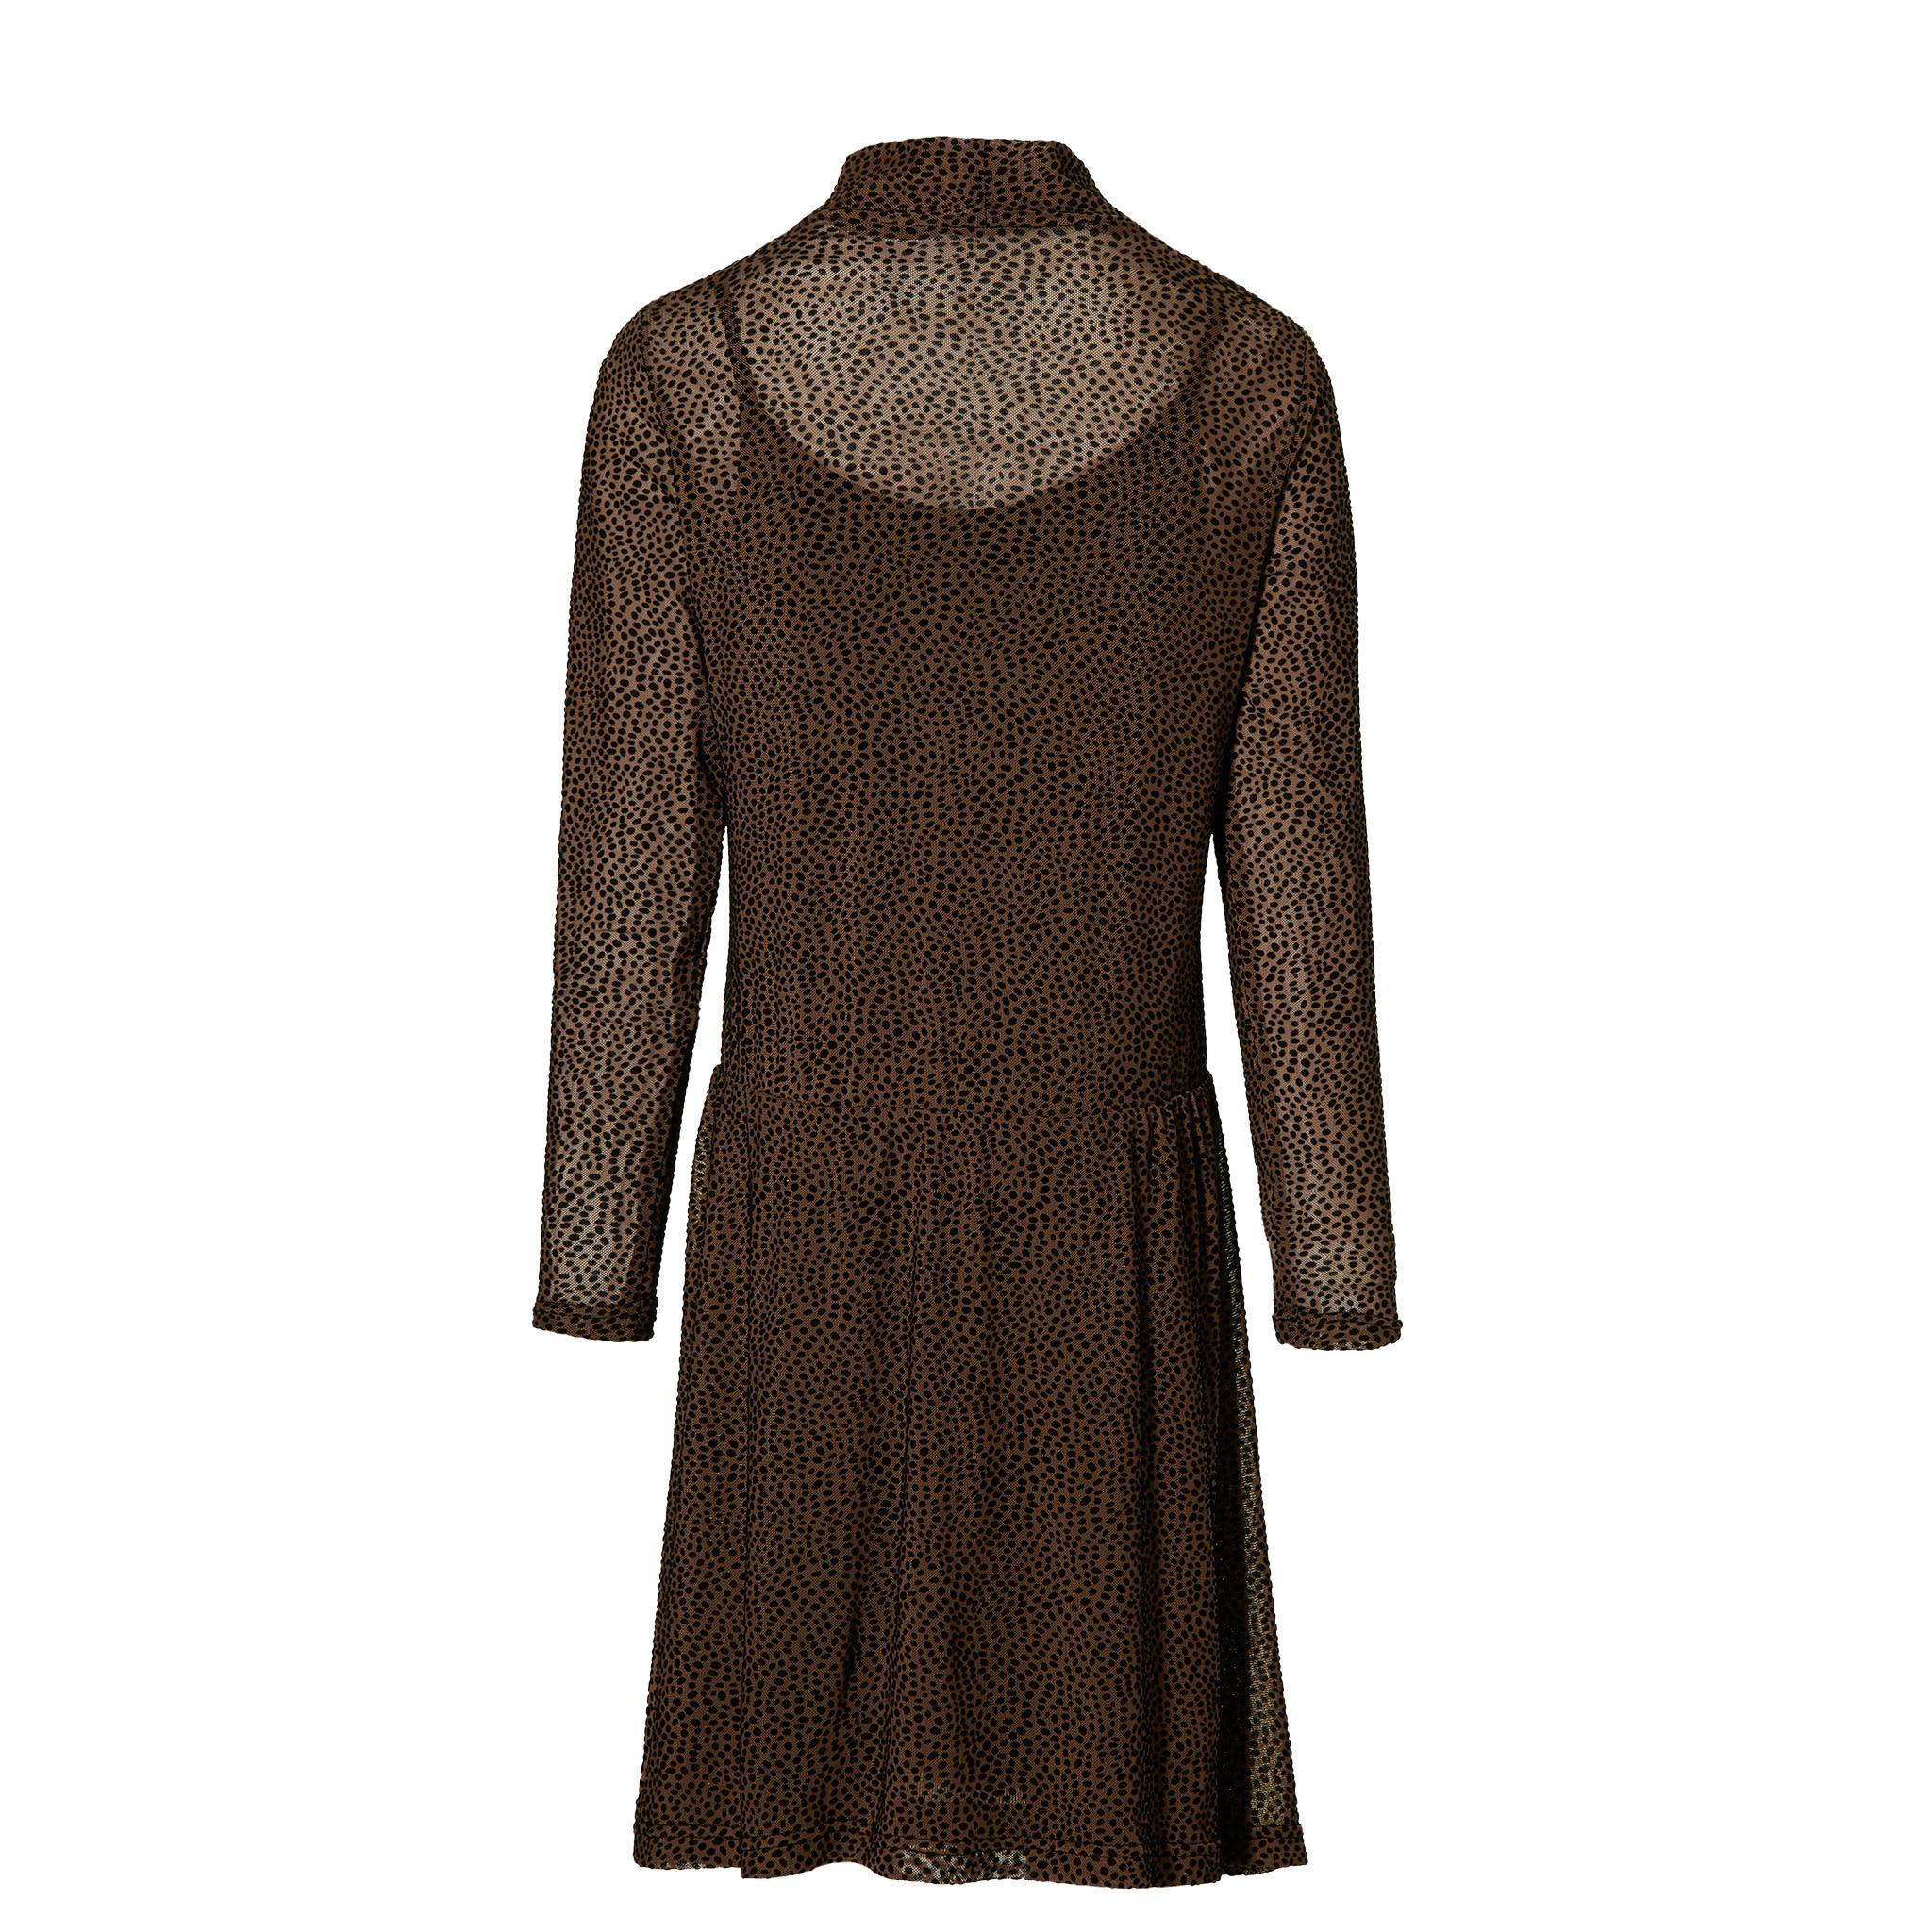 Kaitlyn Dress